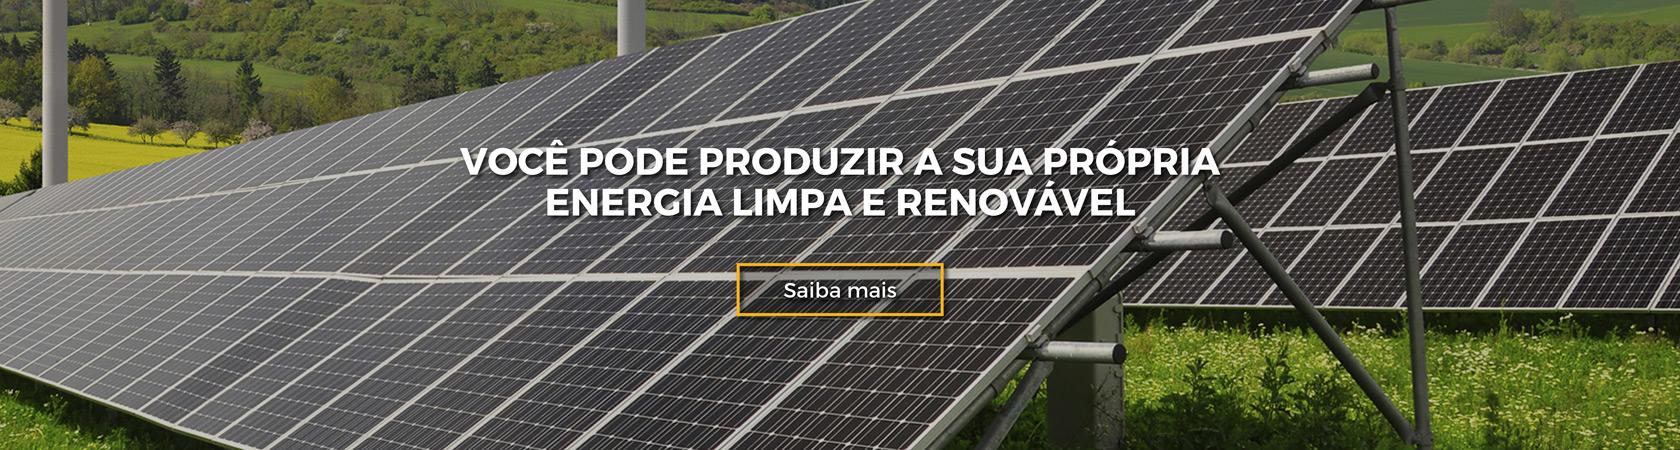 banner-domus-solar-empresa_2